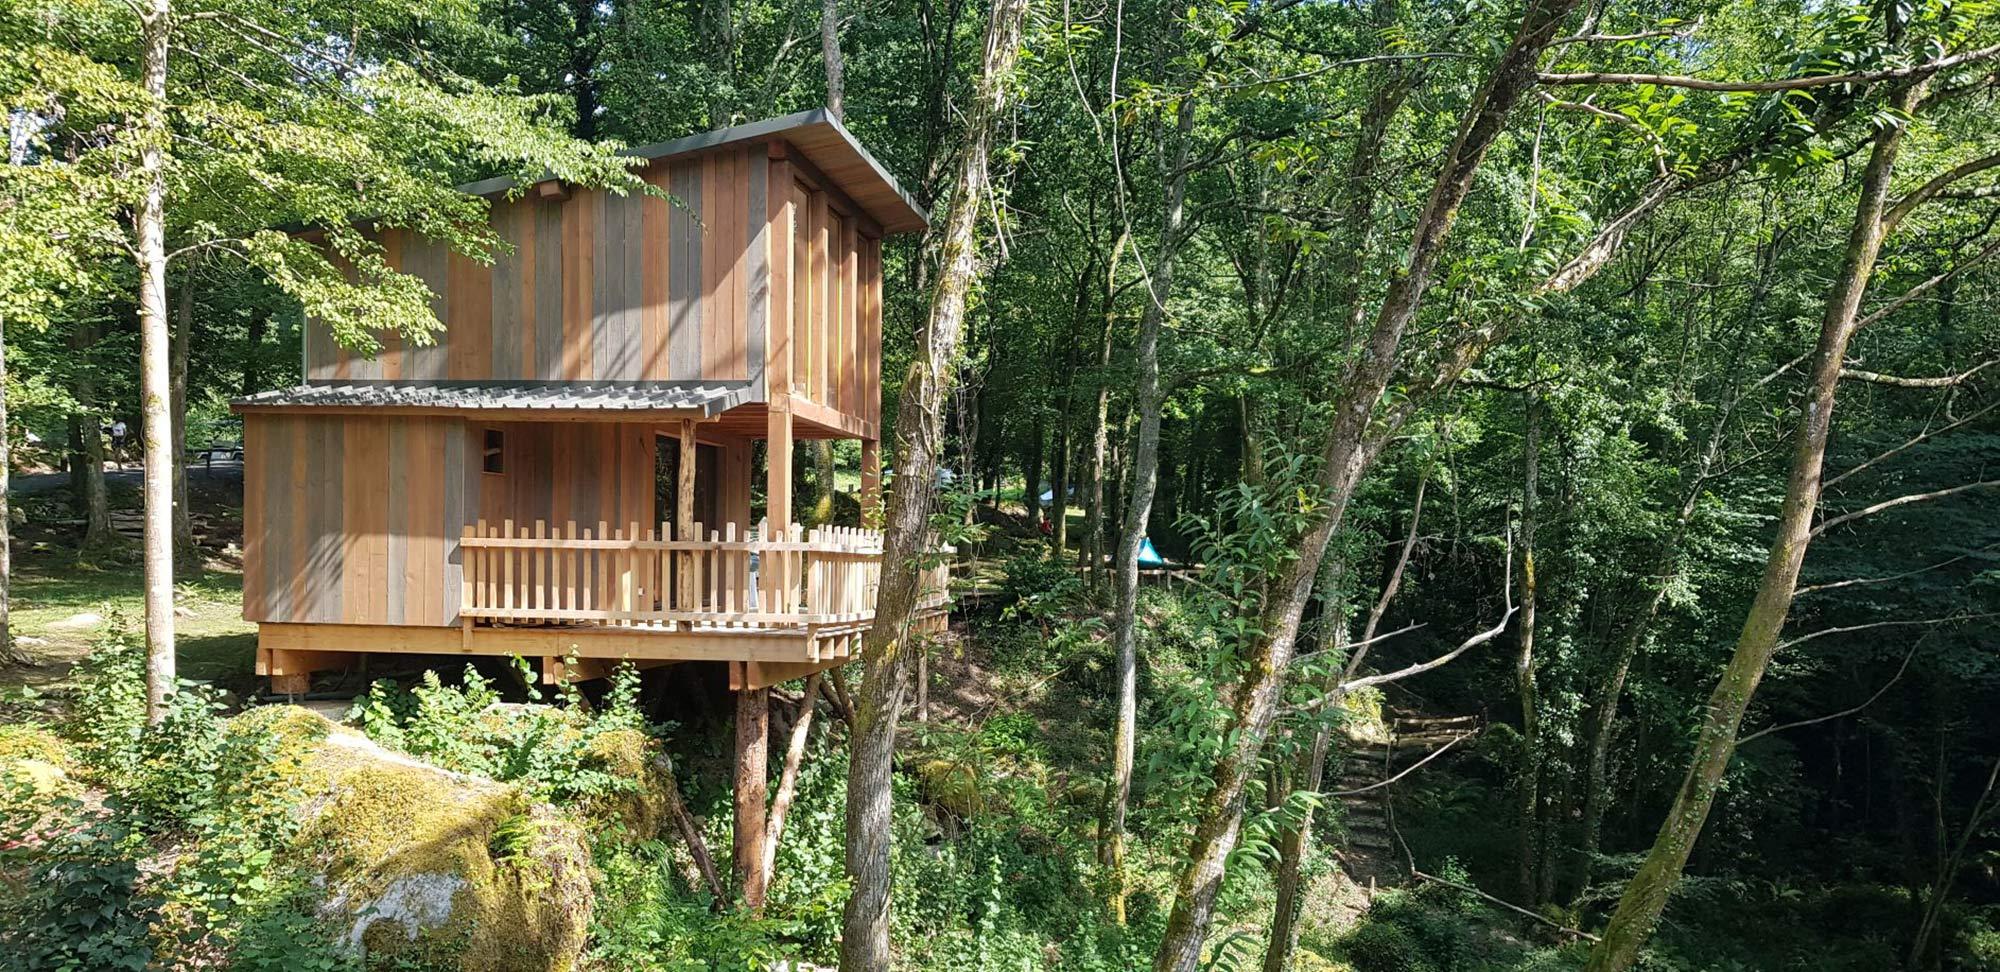 stay Pyrenean refuge mountain nature sanctuary Lourdes